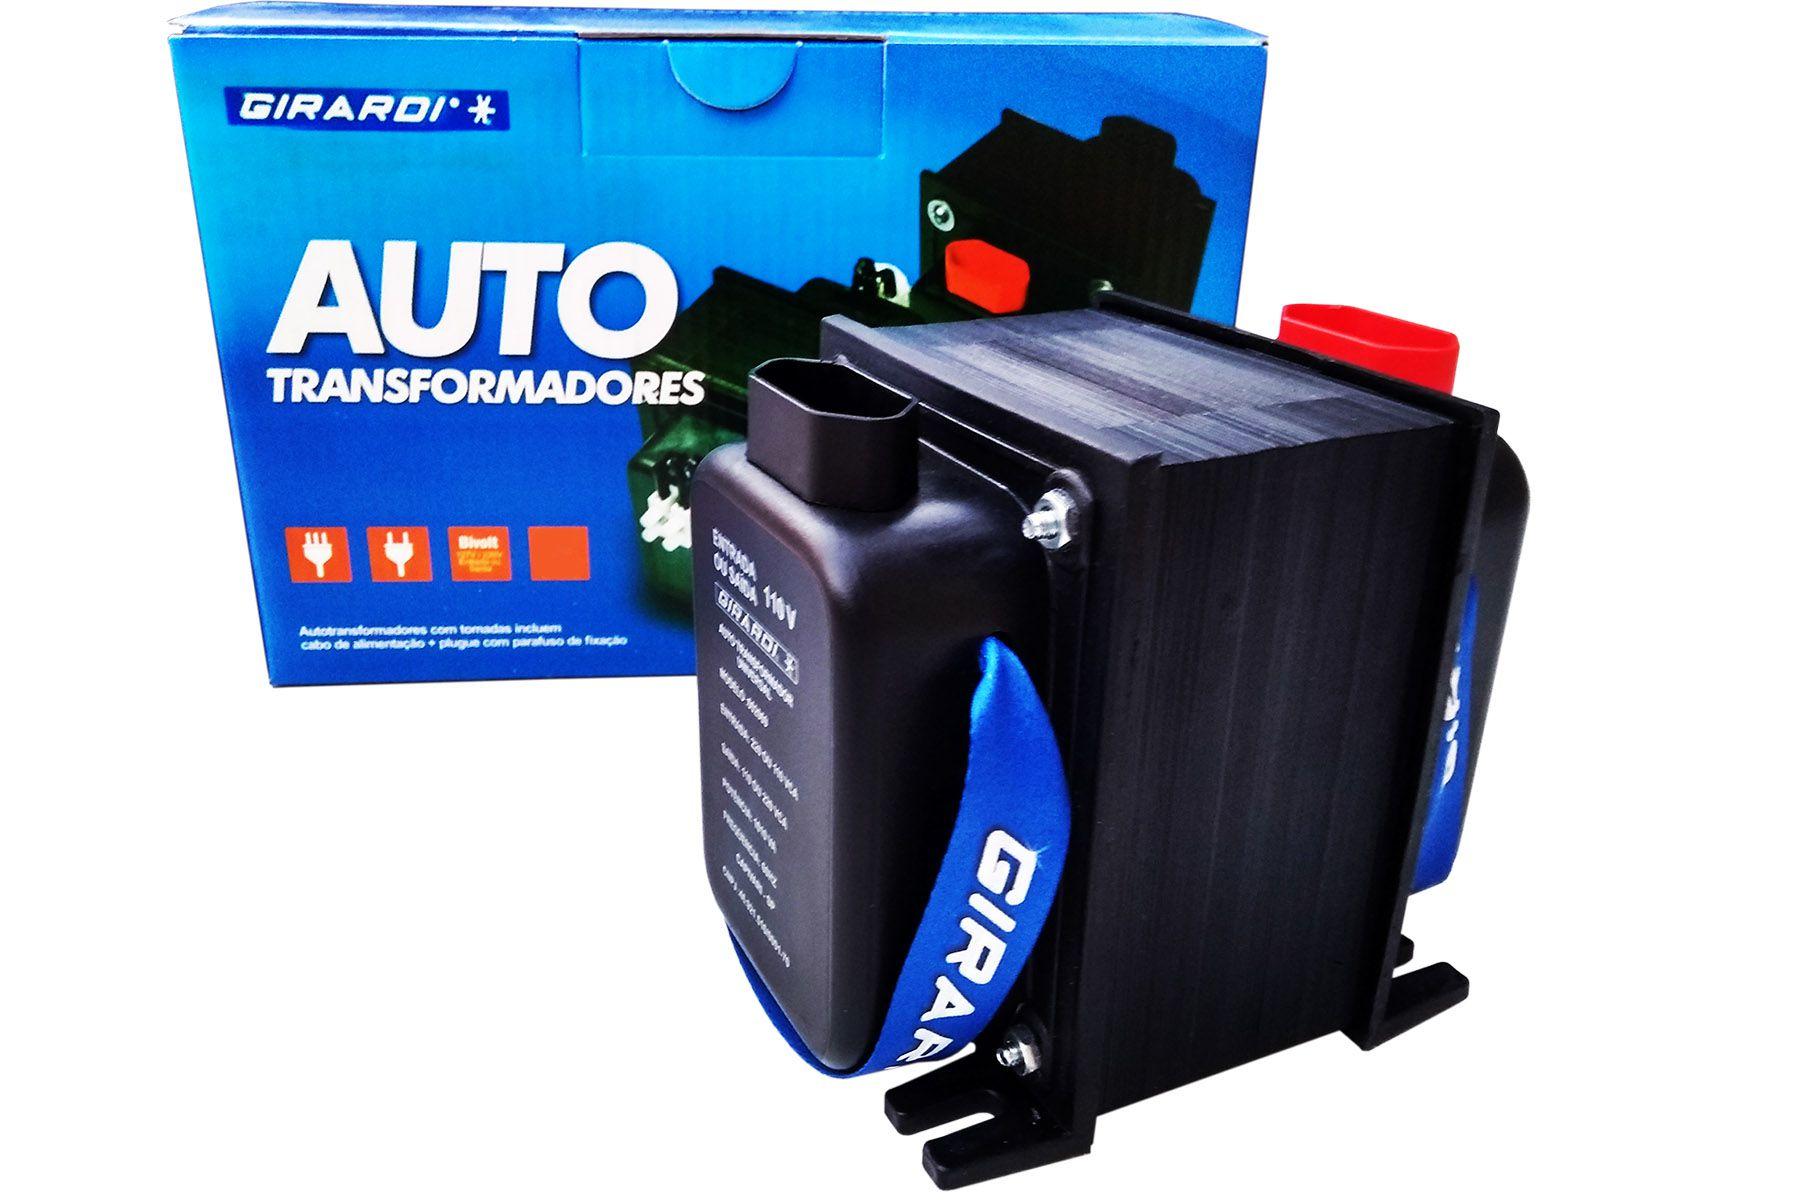 Auto Transformador Conversor Bivolt 110 / 127 e 220 V GIRARDI Profissional 1010 VA / 710 W